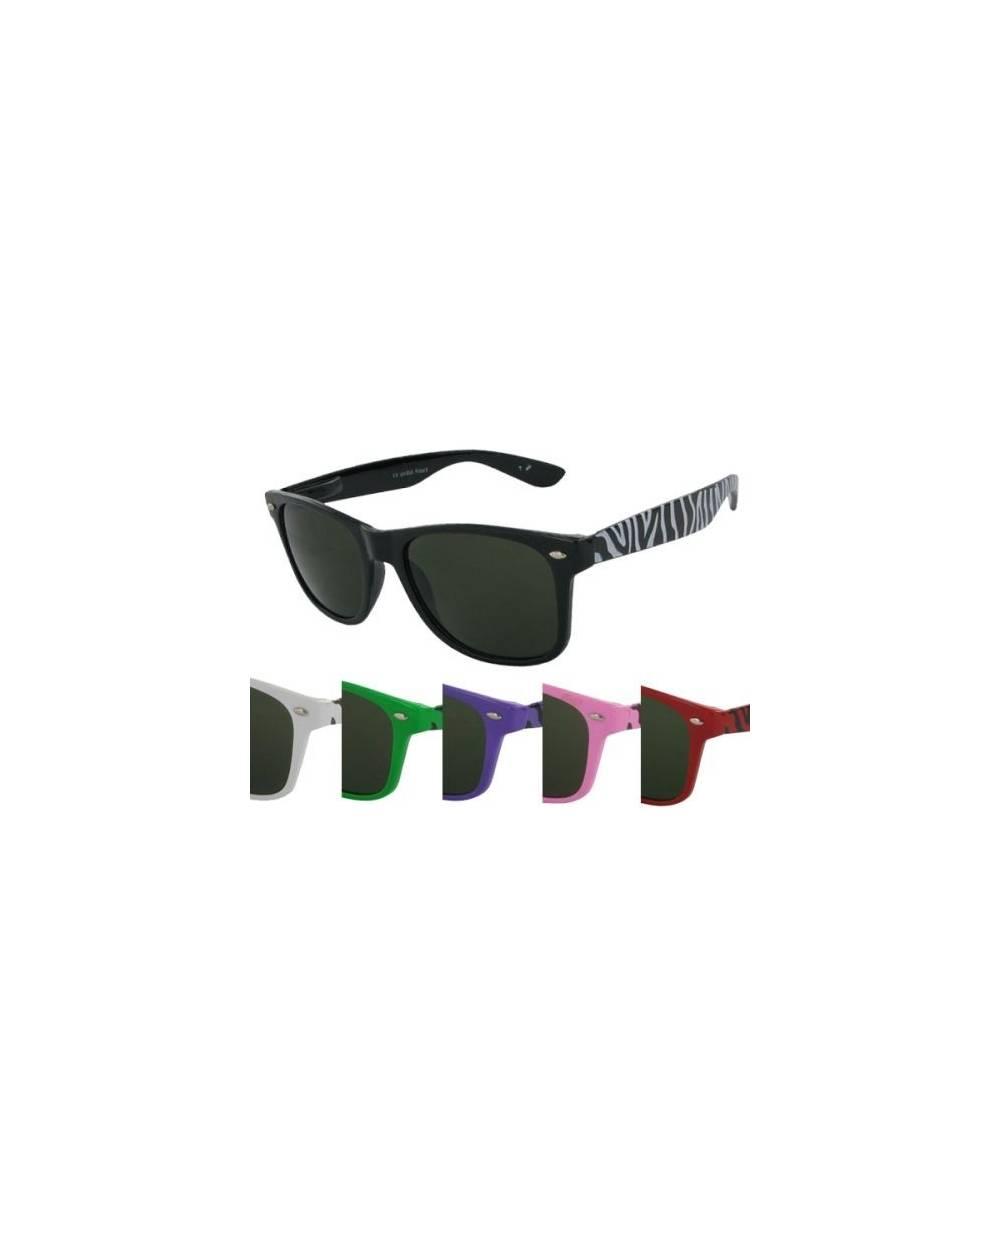 Zebra Glasses, Vive Originality